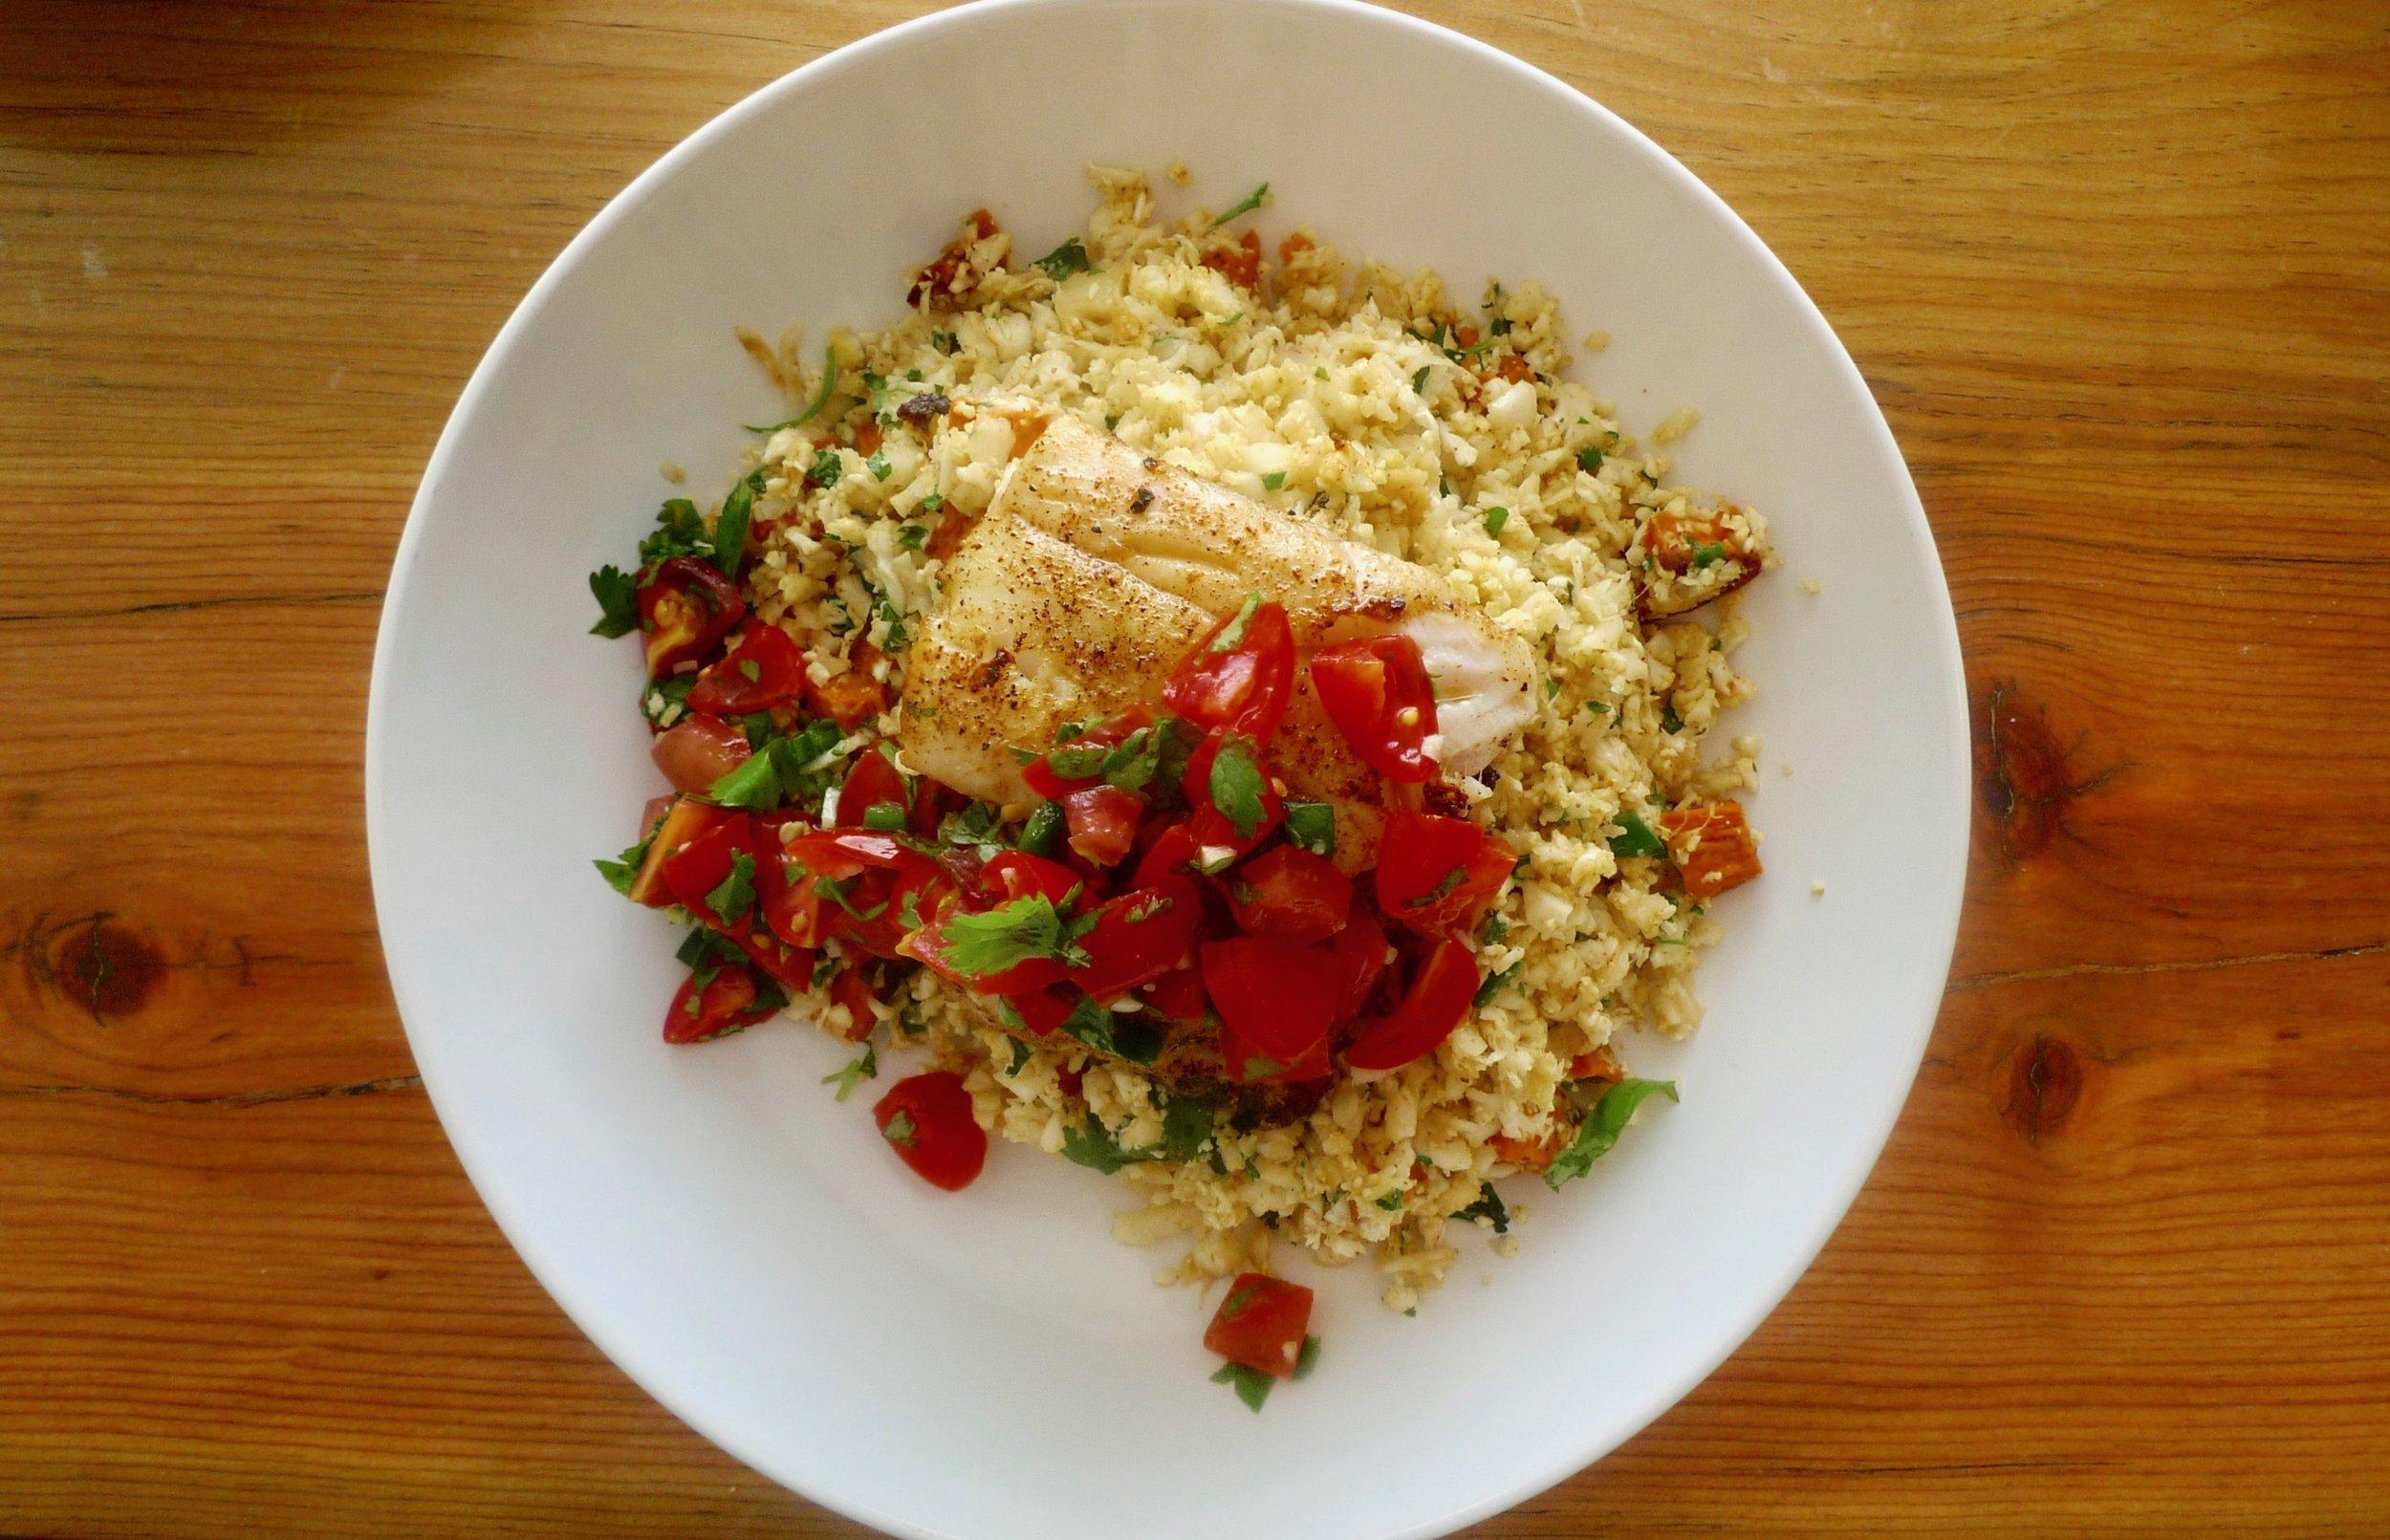 Fish taco bowl with cauliflower rice and pico de gallo.